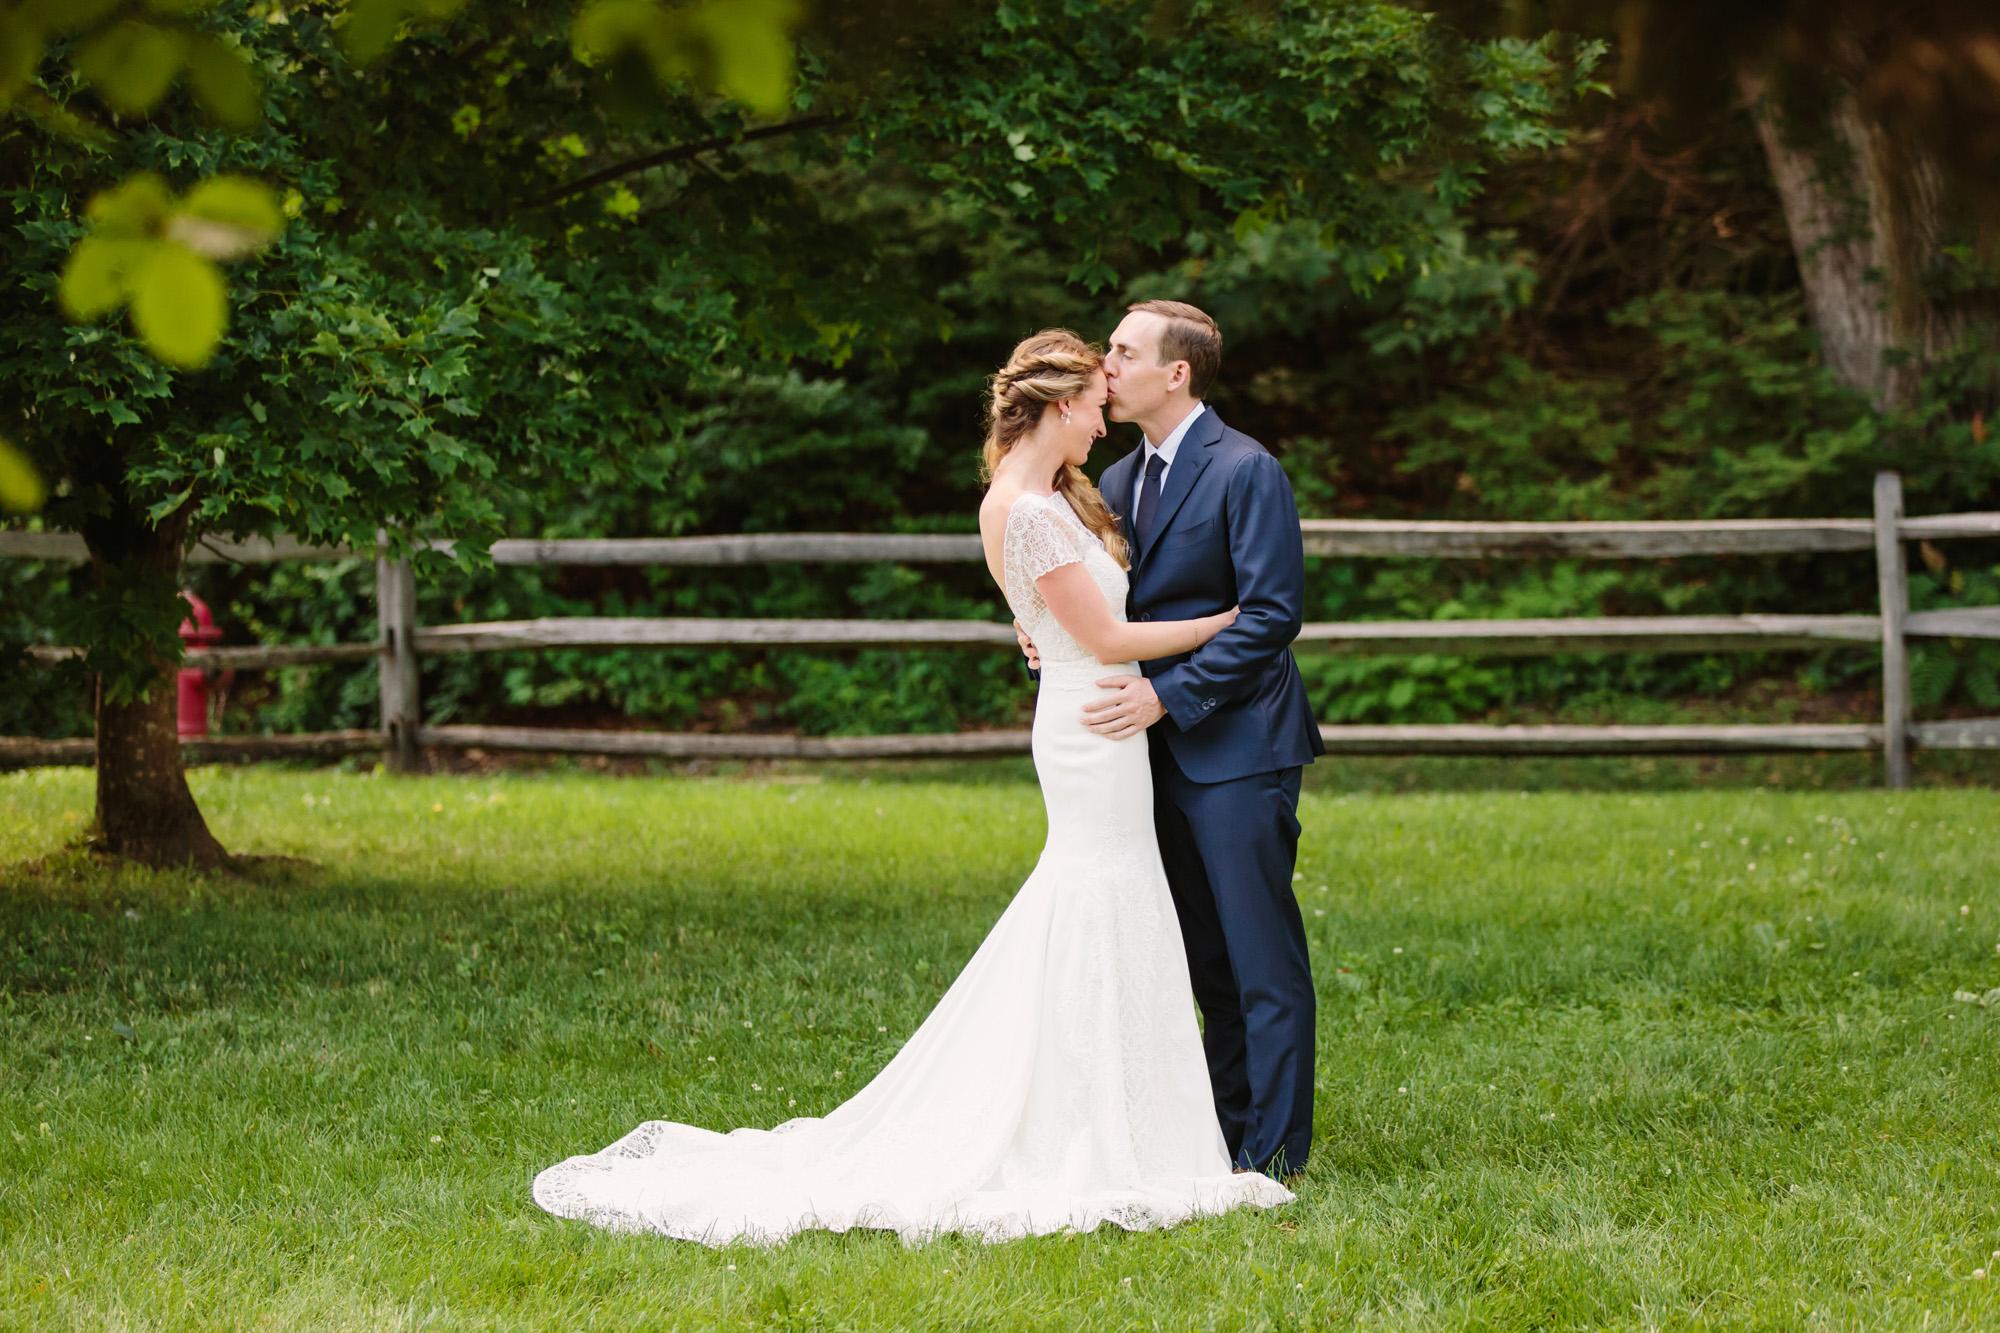 16_Jessica_Ted_Blue_Hill_Stone_Barns_Wedding_Pocantico_NY_Tanya_Salazar_Photography_037.jpg